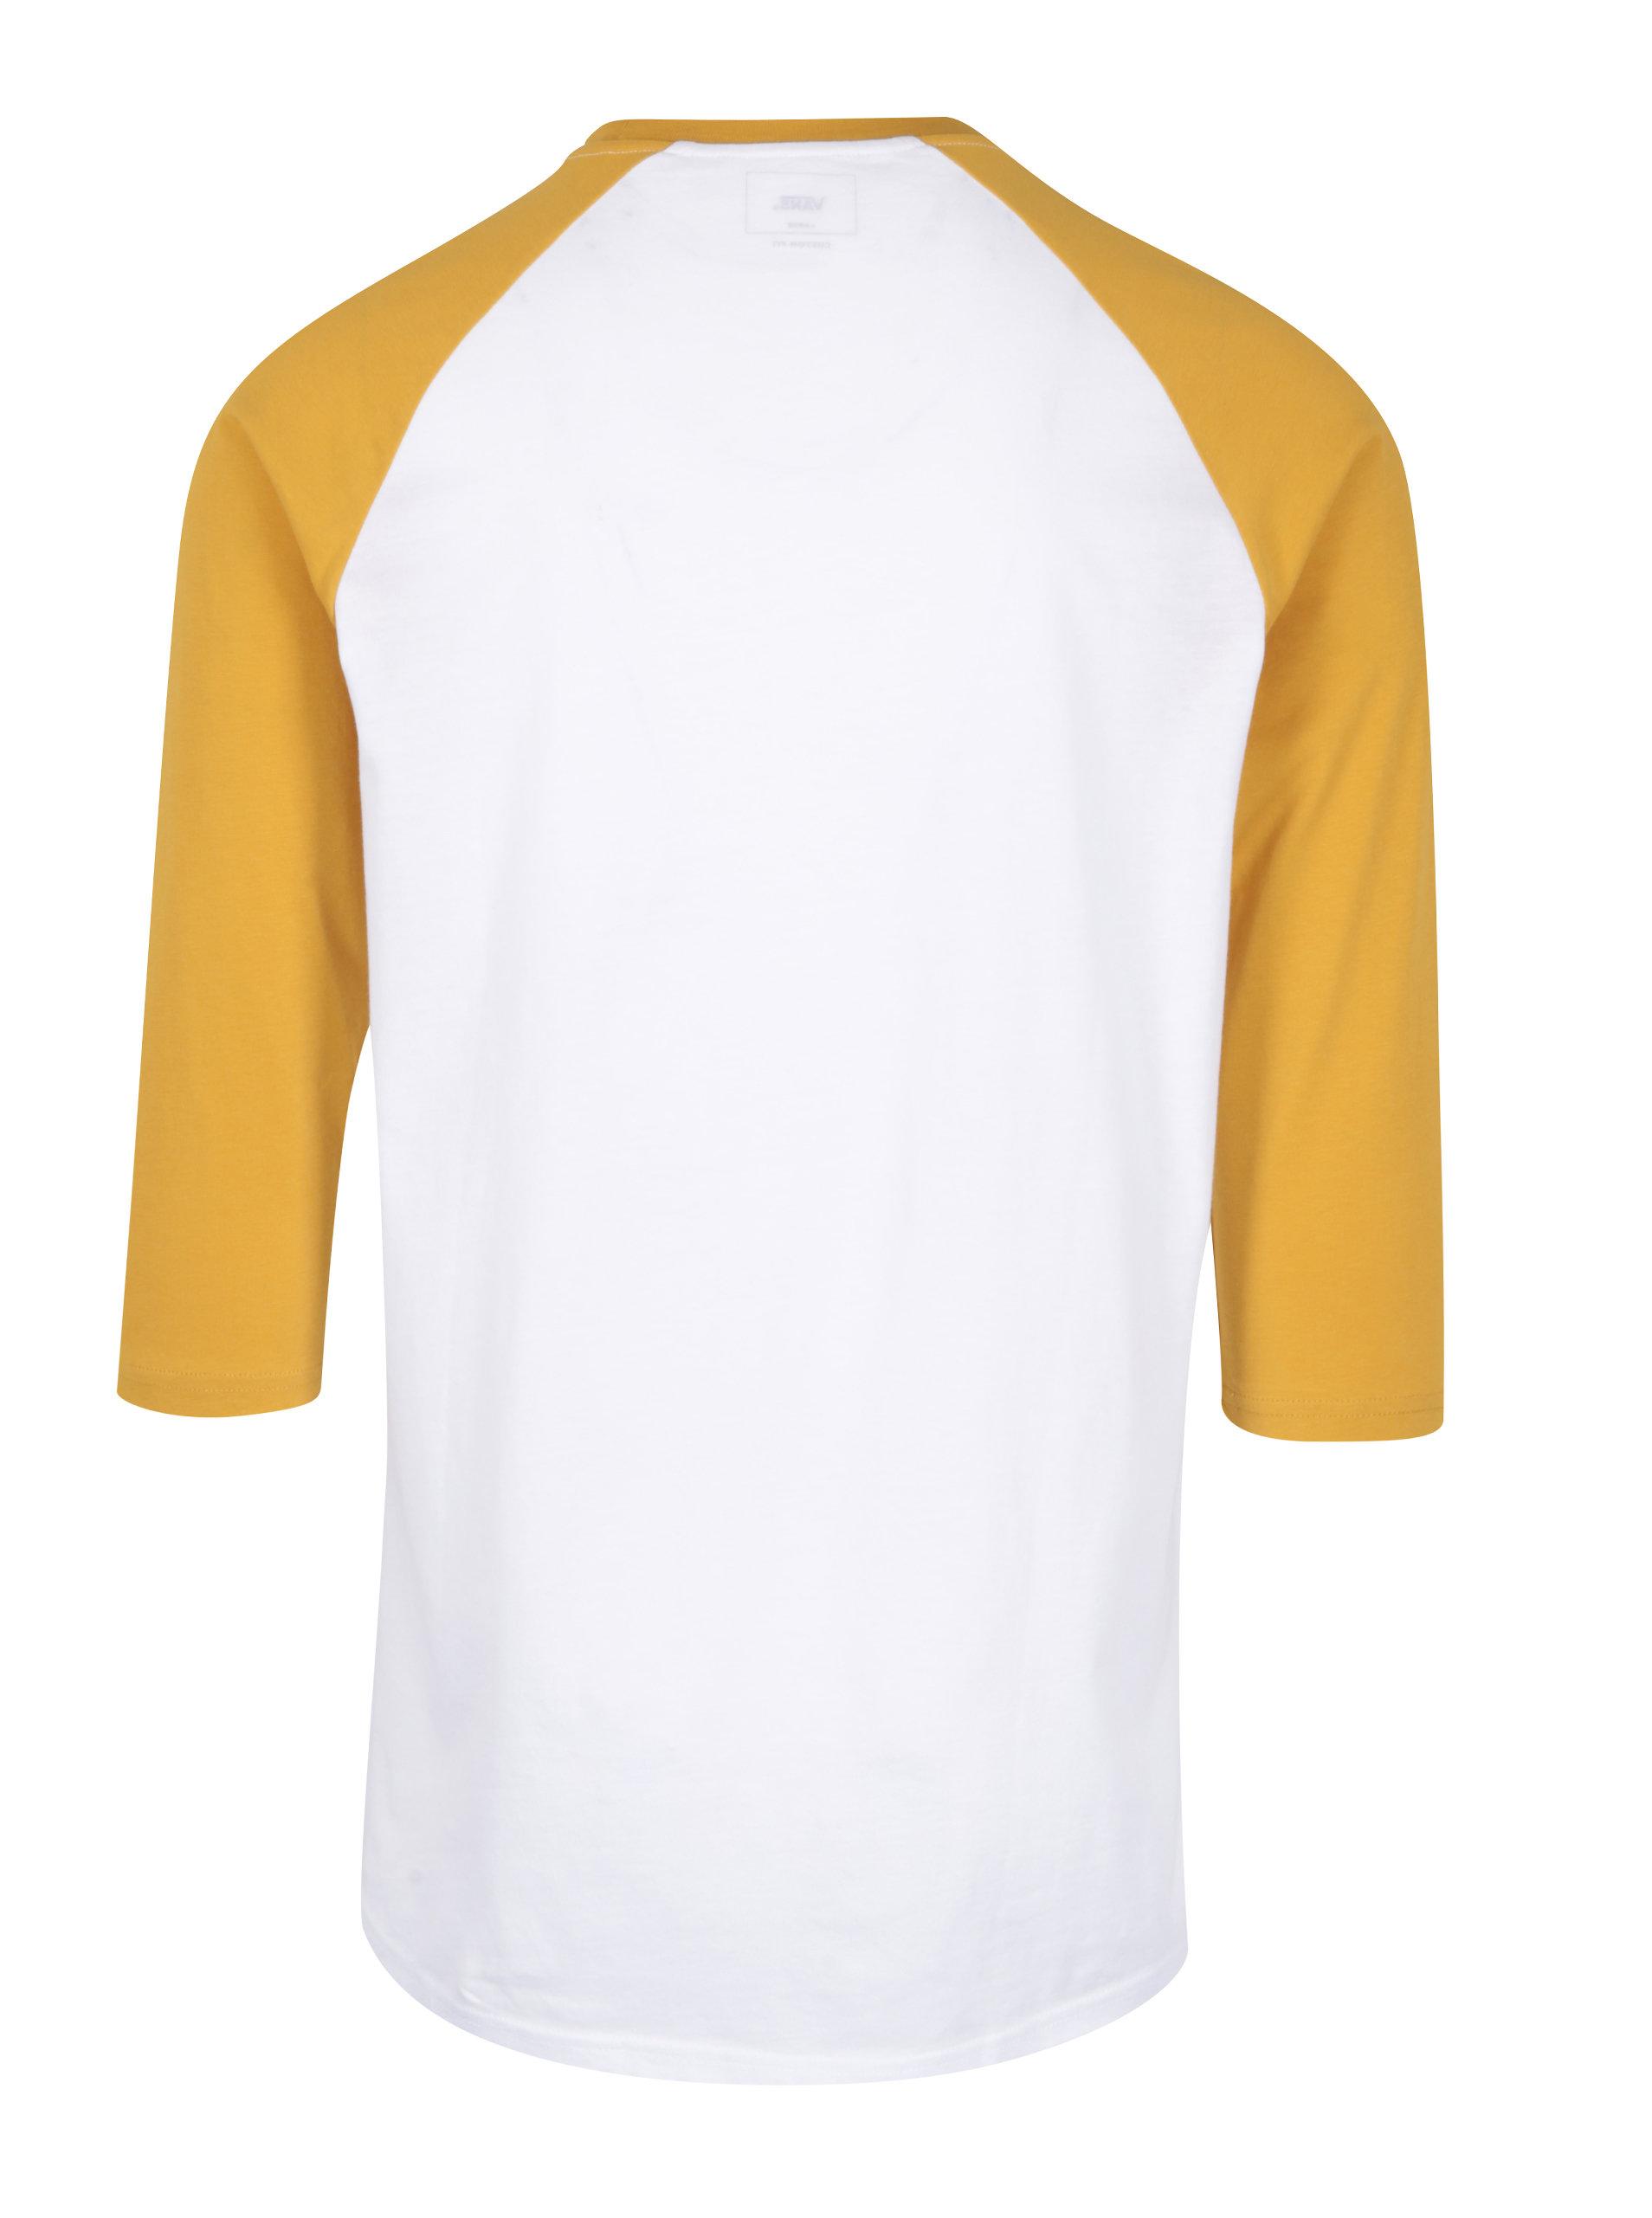 a07087ef71c Žluto-bílé pánské tričko s 3 4 rukávem VANS Classic ...